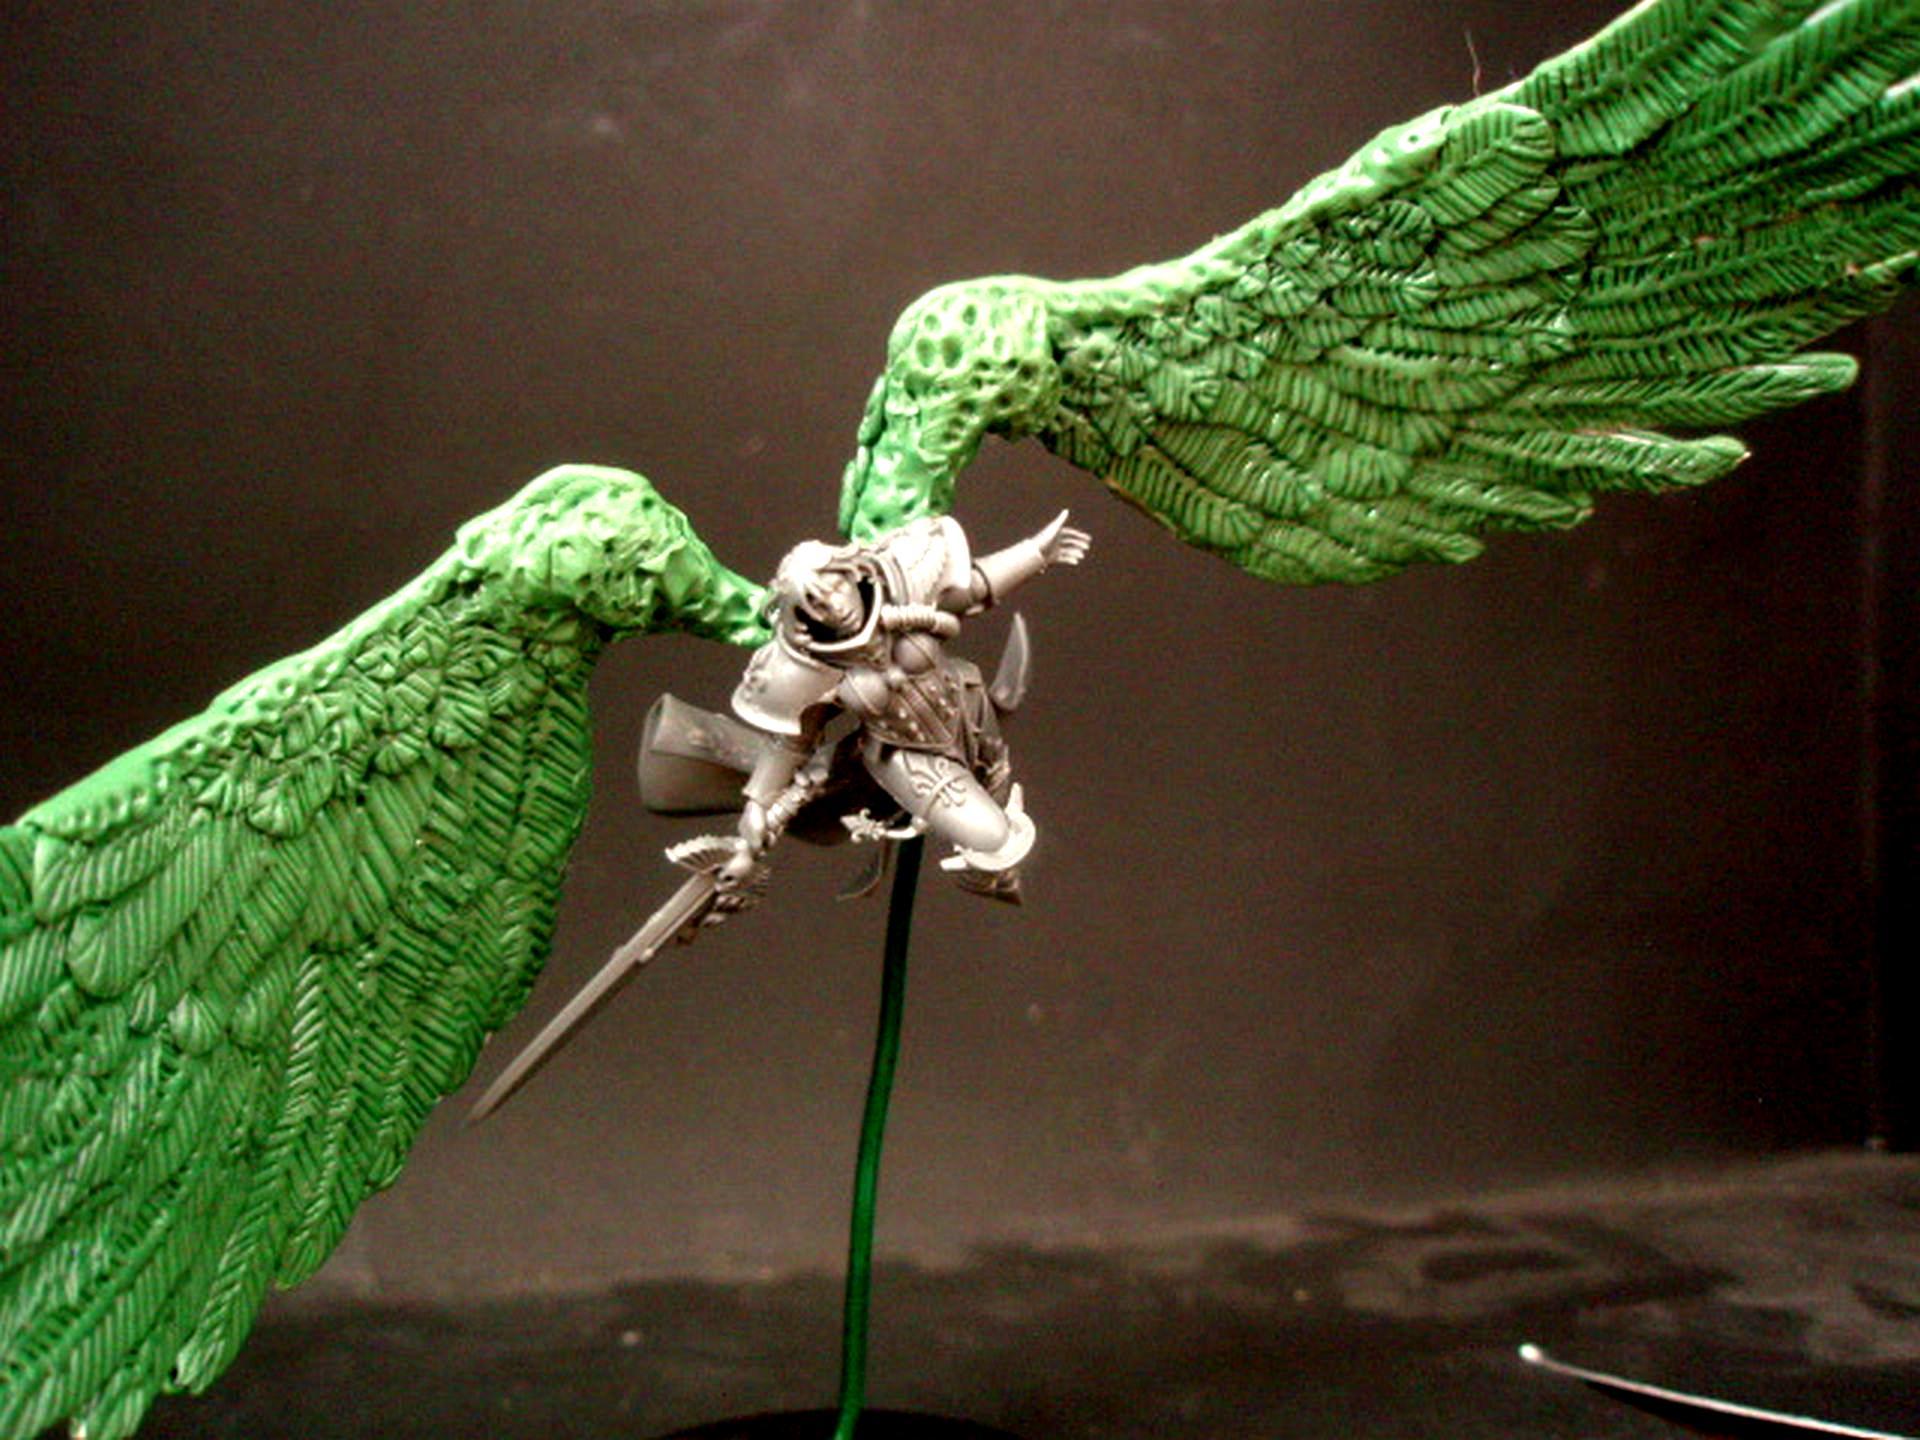 Celestine, Celestine Sculpt, Celestine Wings, Winged